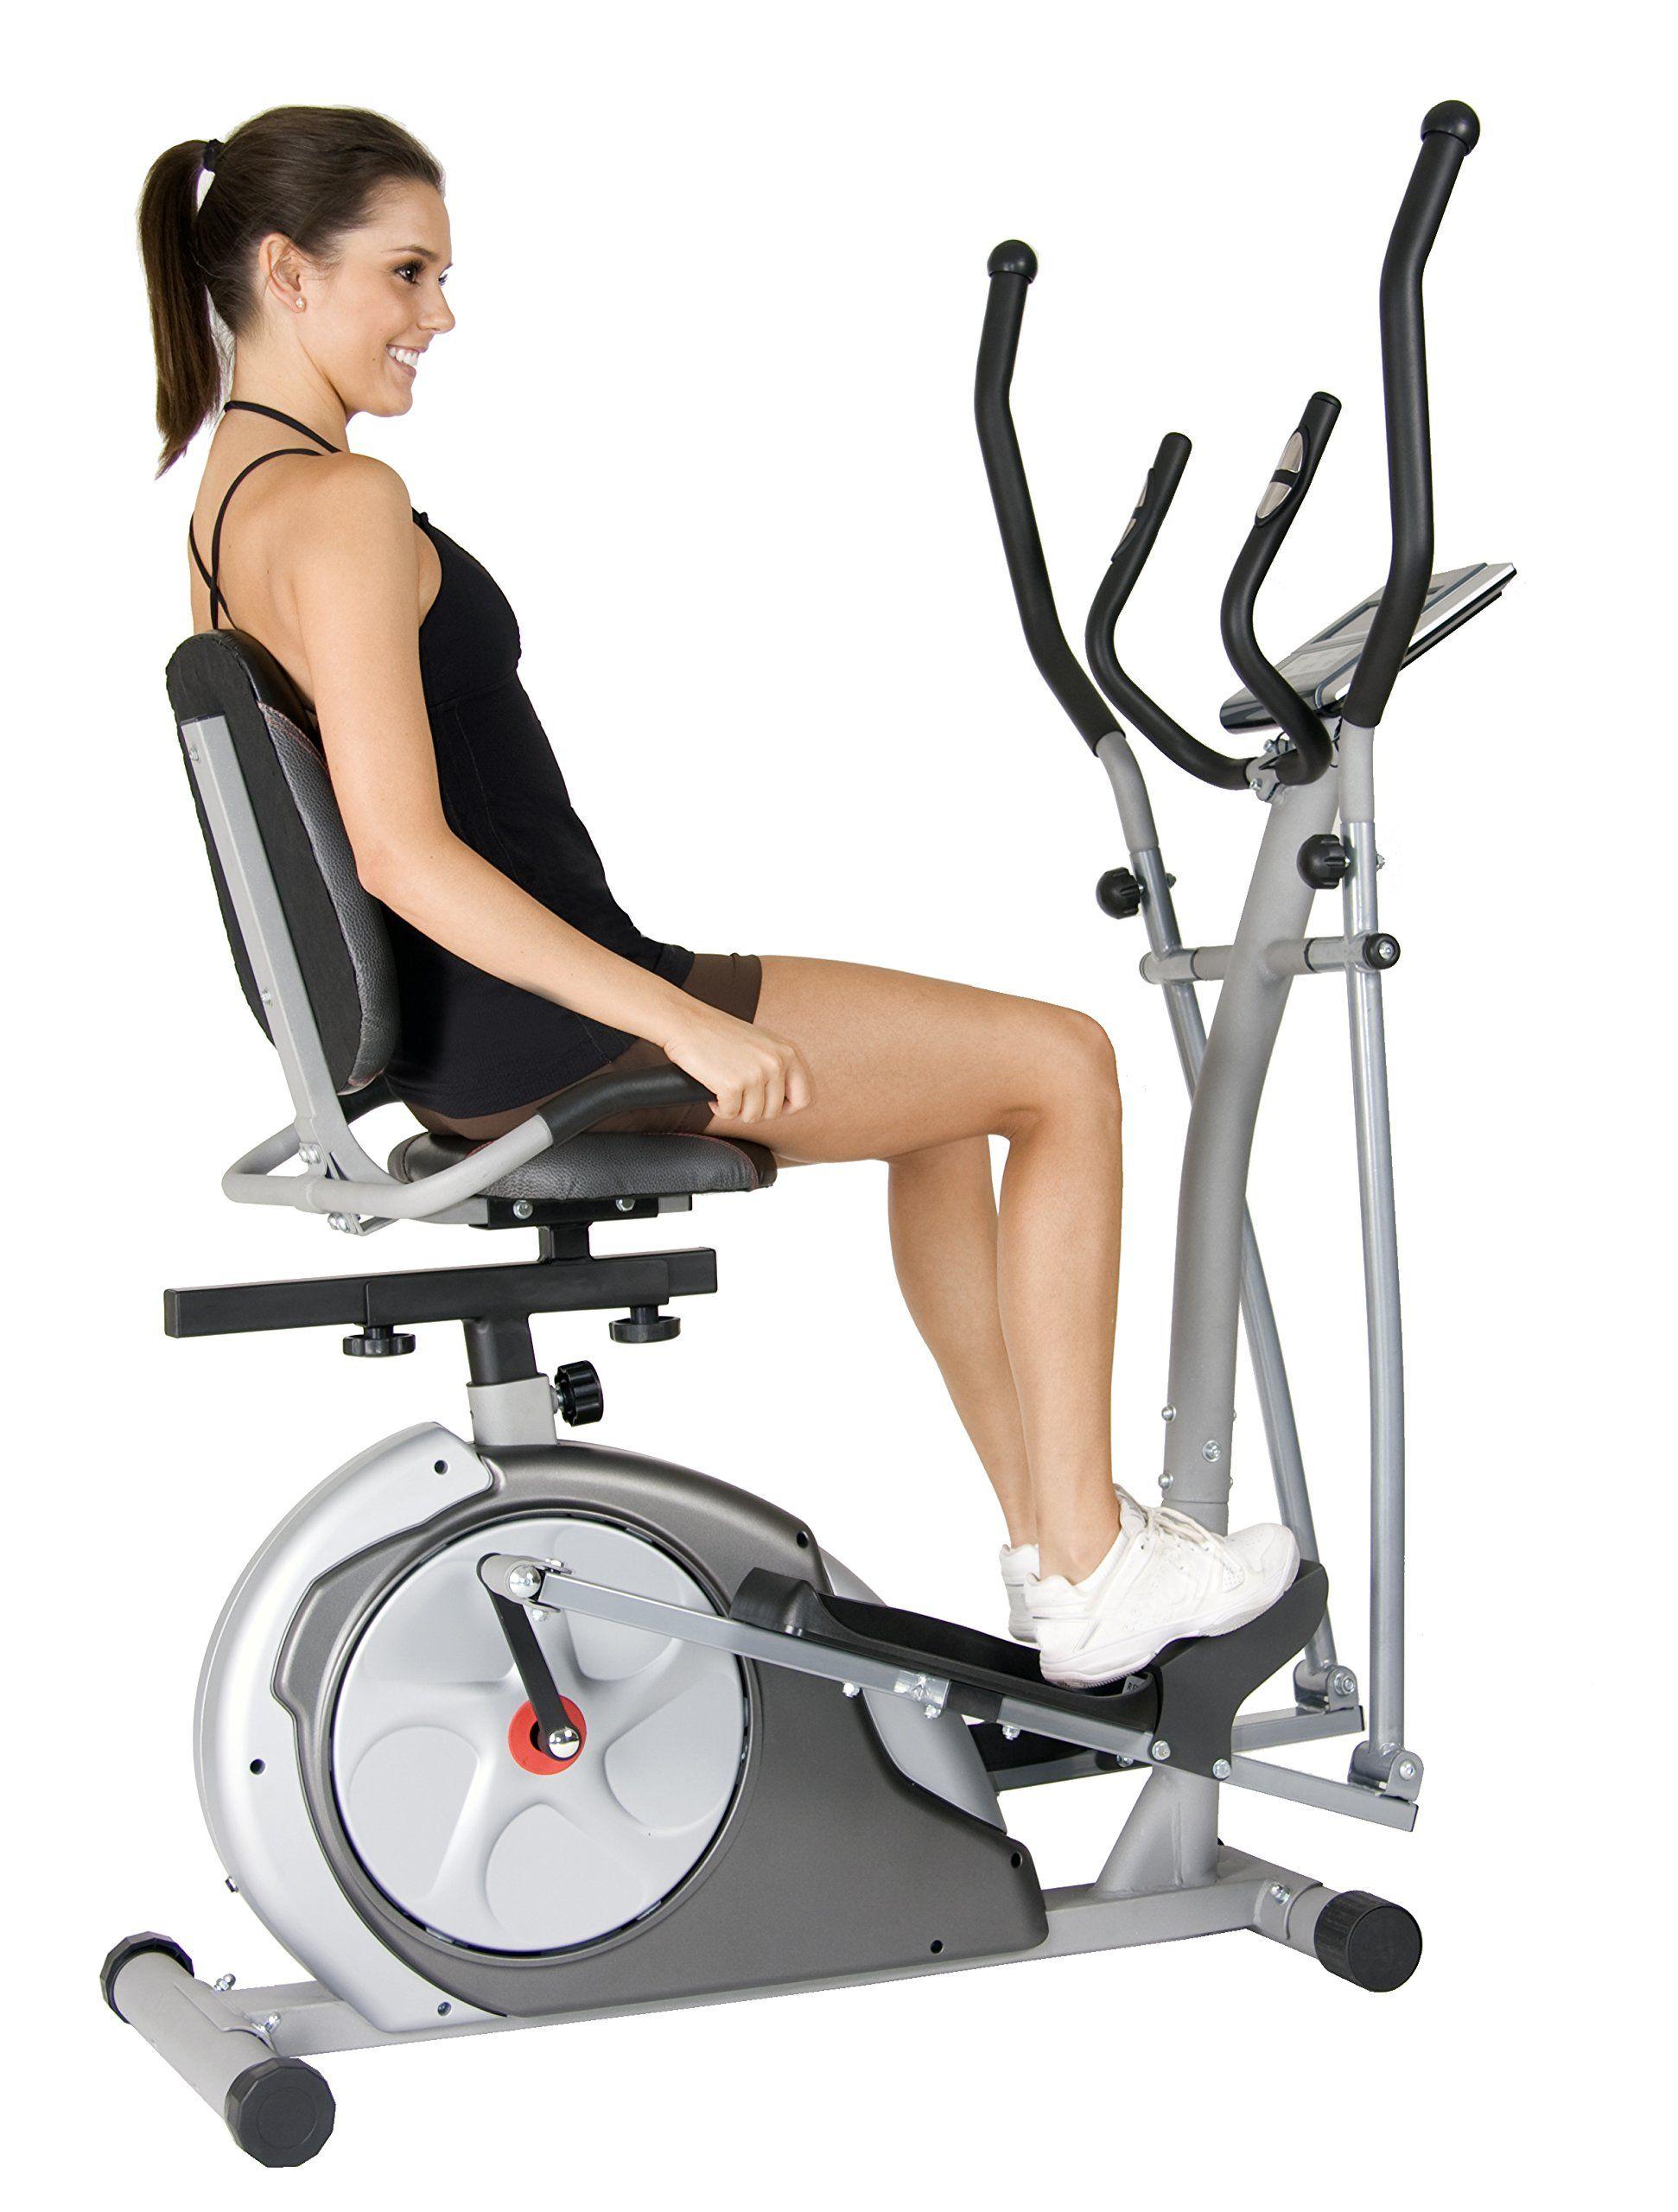 Amazon Com Body Rider 3 In 1 Trio Trainer Silver Red Exercise Bikes Sports Outdoors Exercise Bikes Biking Workout Recumbent Bike Workout